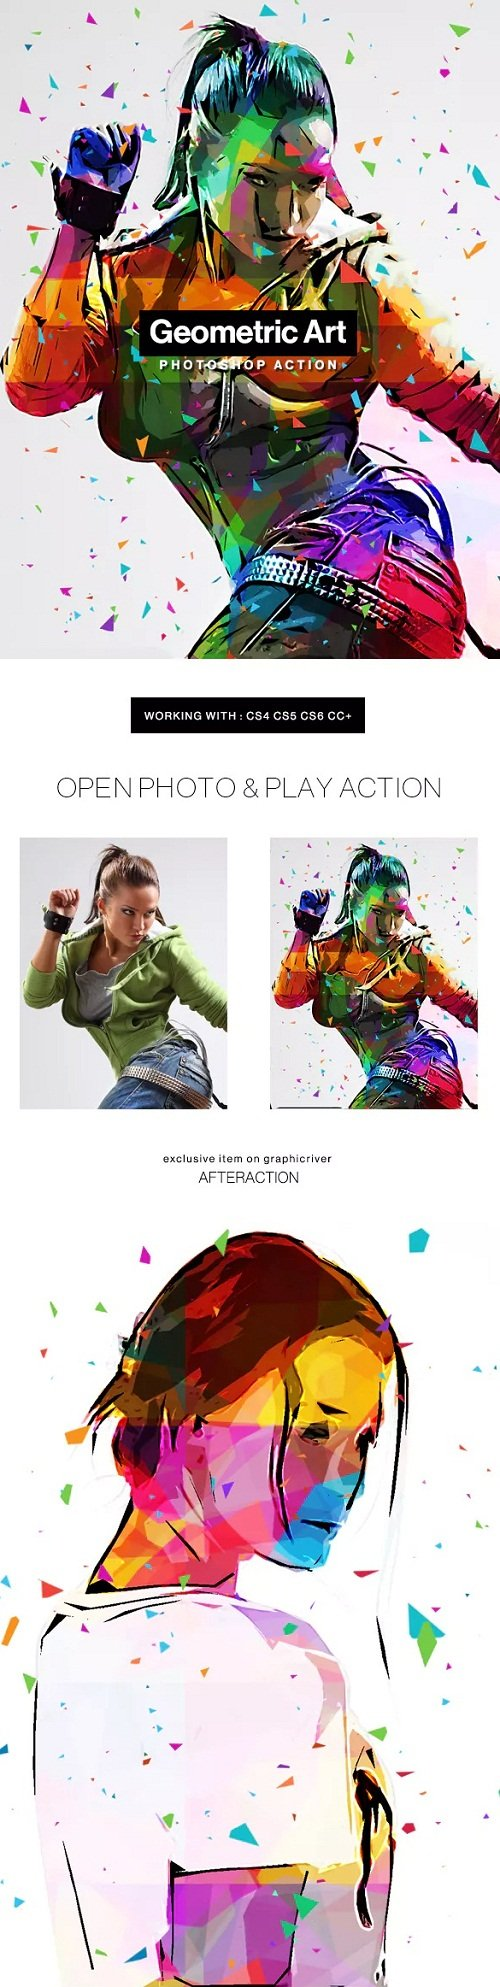 Geometric Art Photoshop Action - 20543613